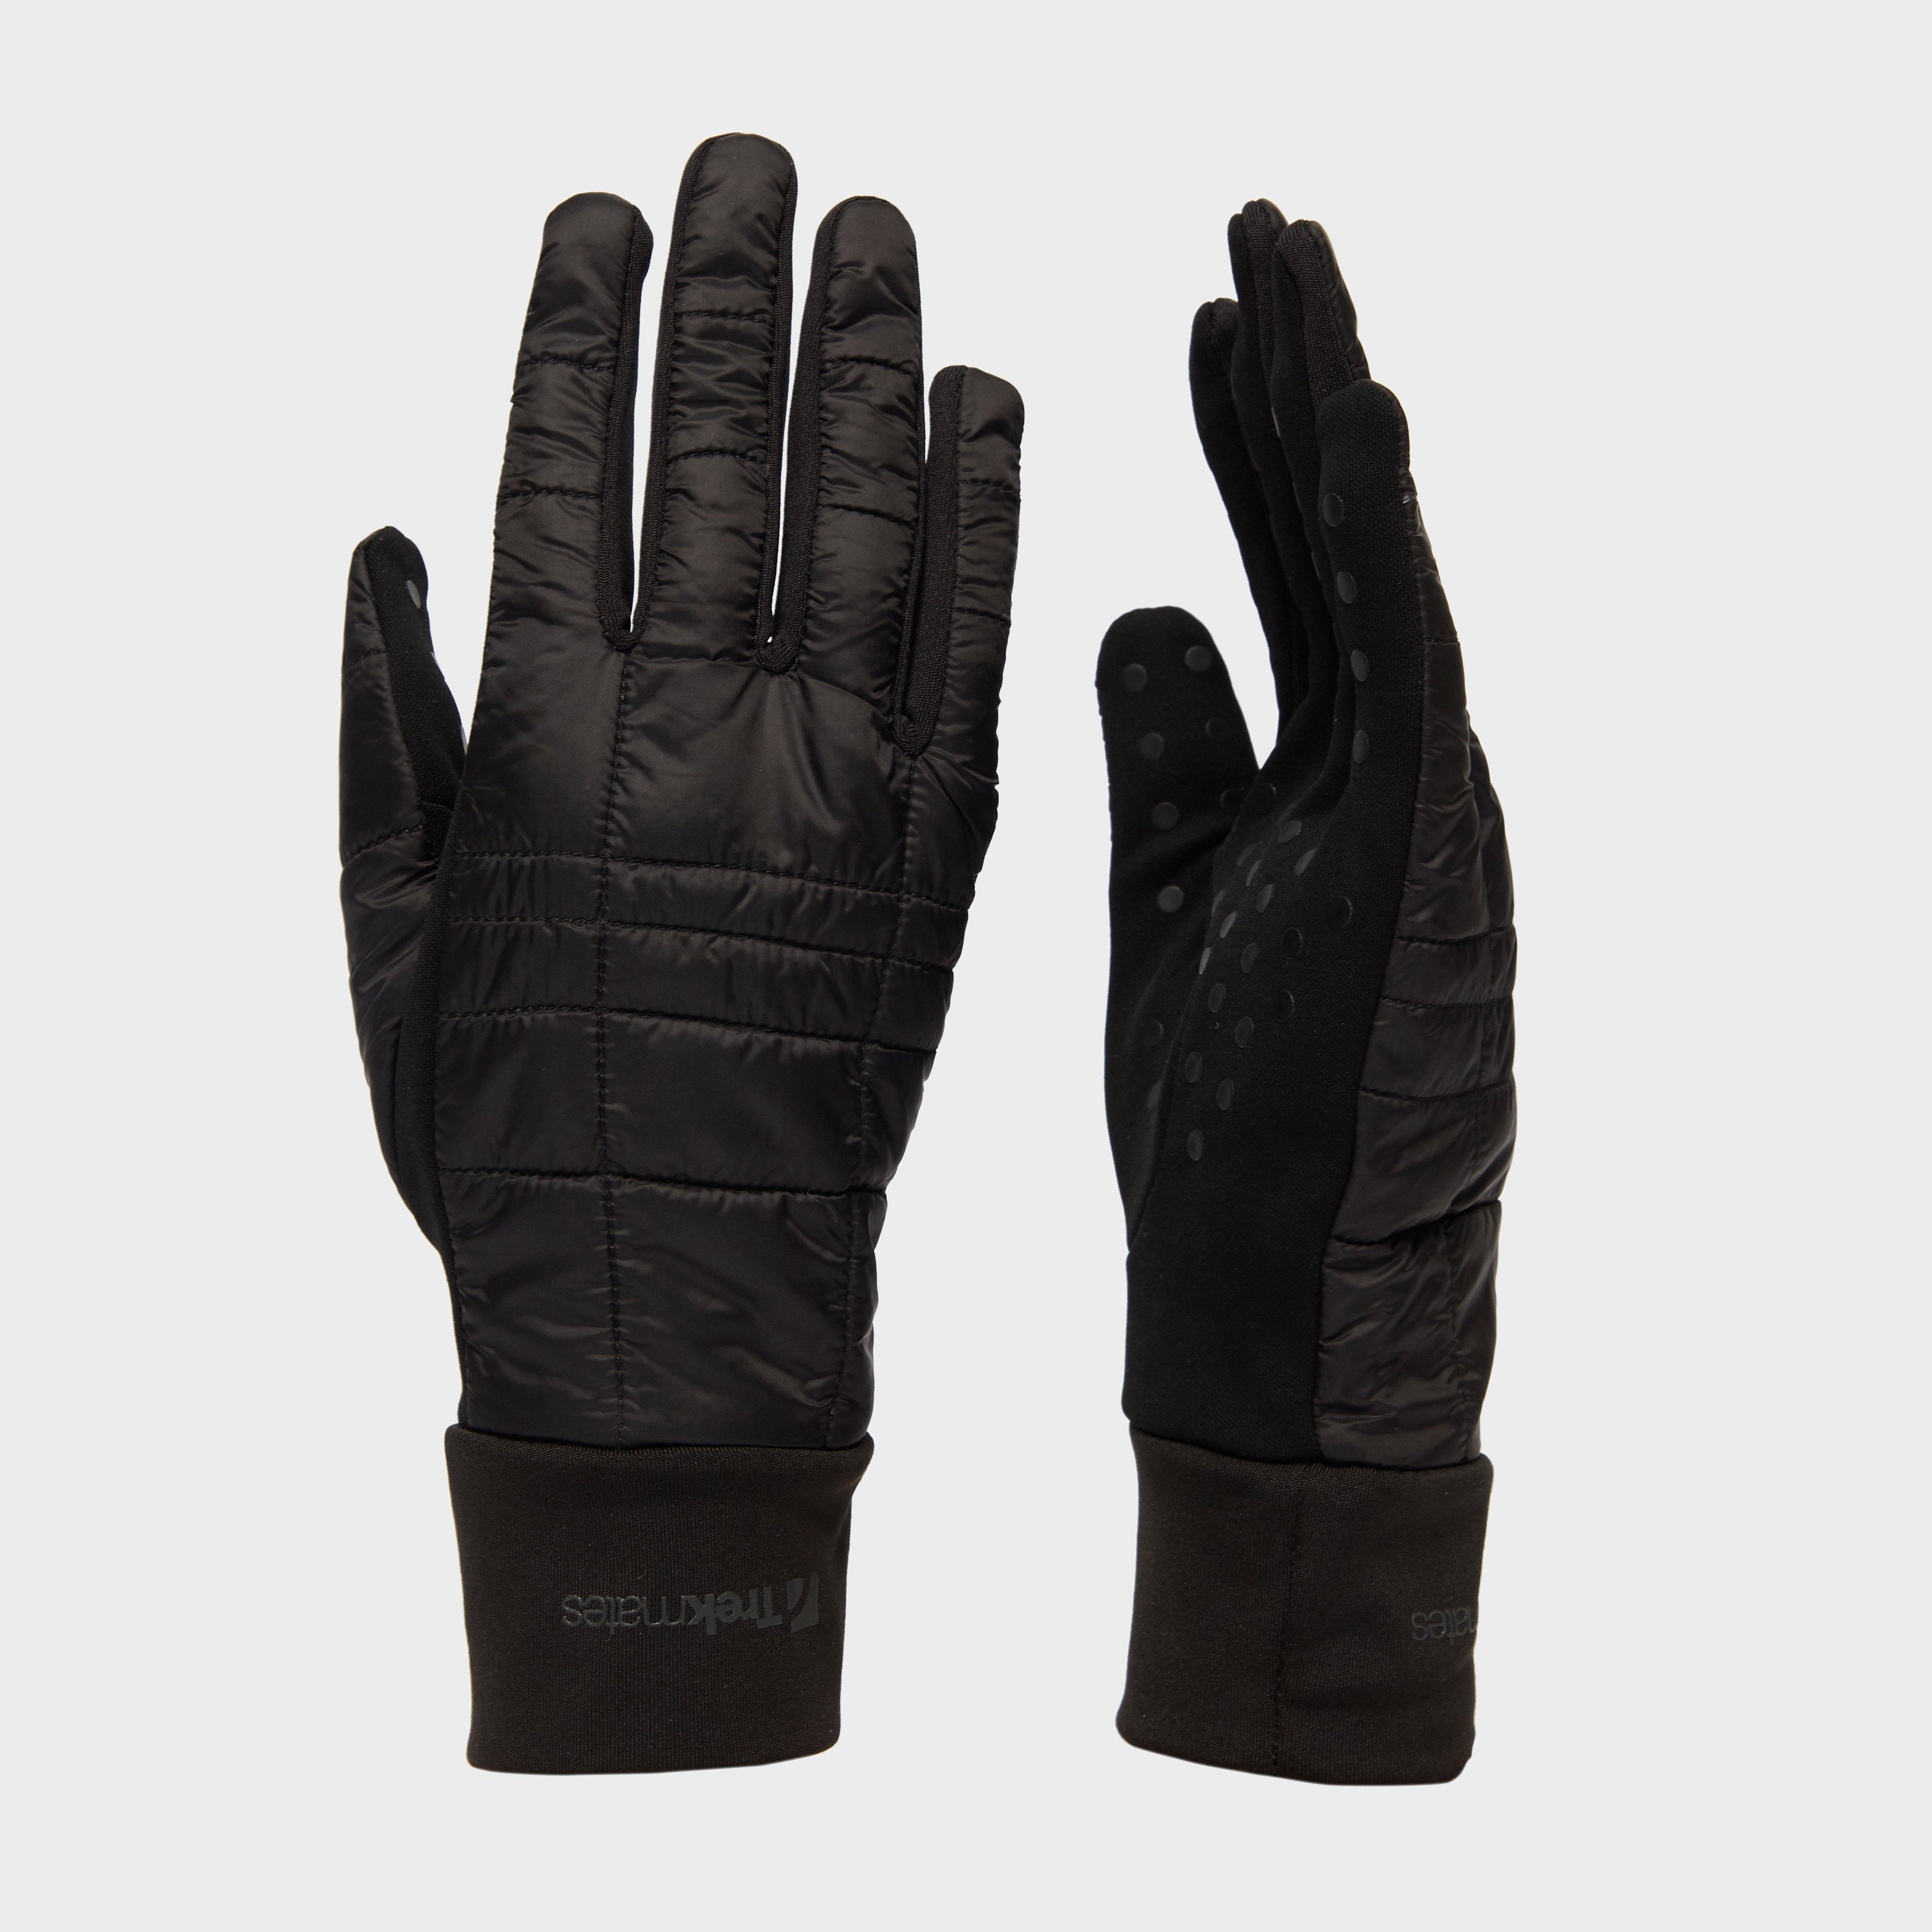 Trekmates Trekmates Womens Stretch Grip Hybrid Gloves - Black, Black